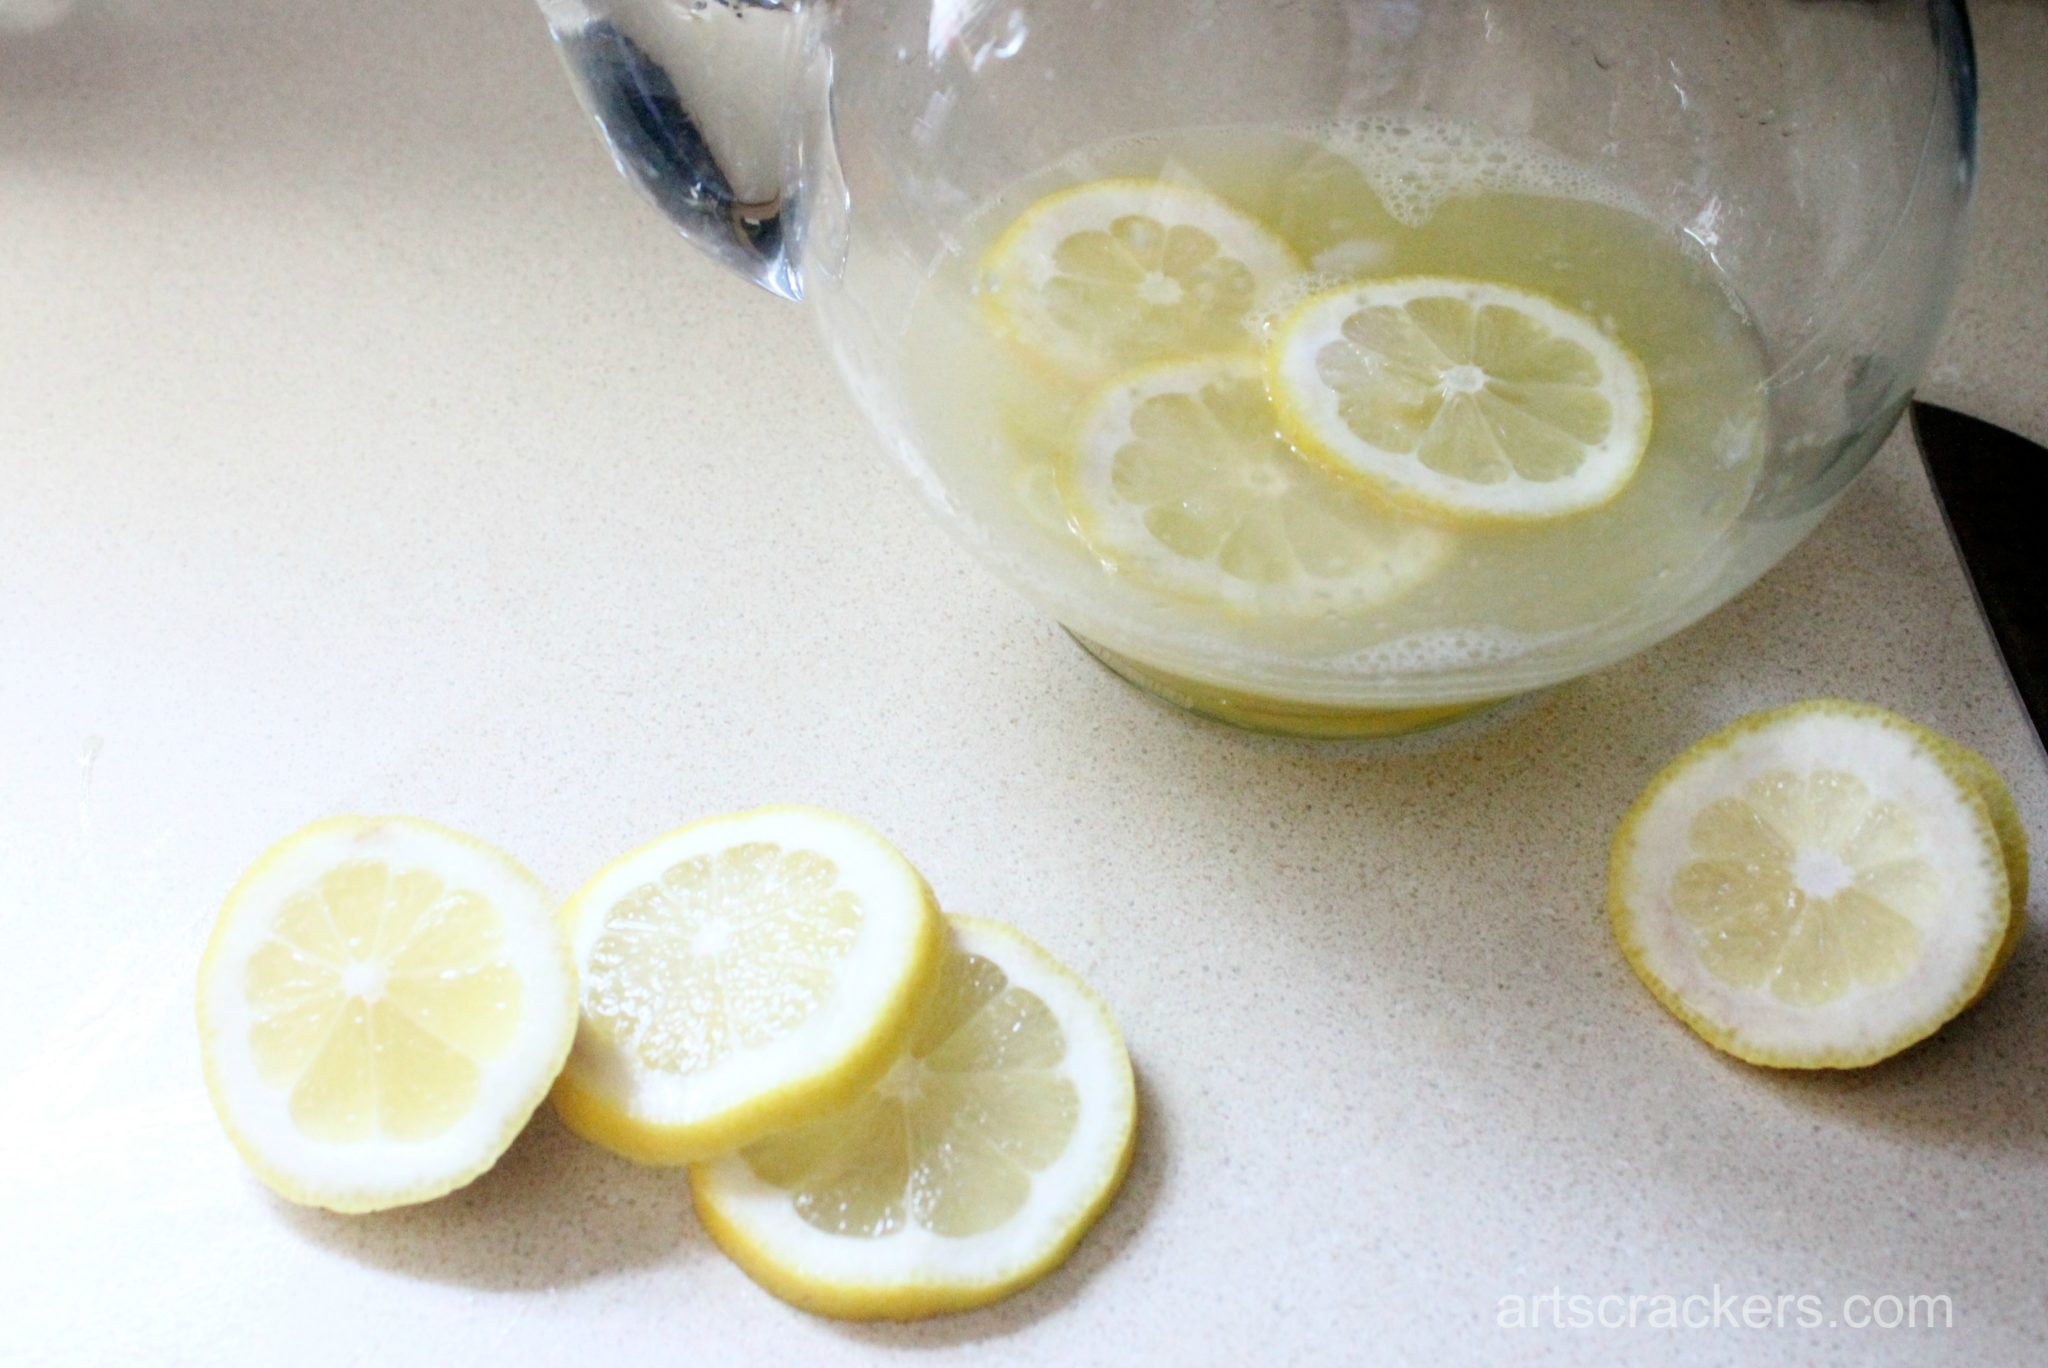 Homemade Blueberry Lemonade Step 3